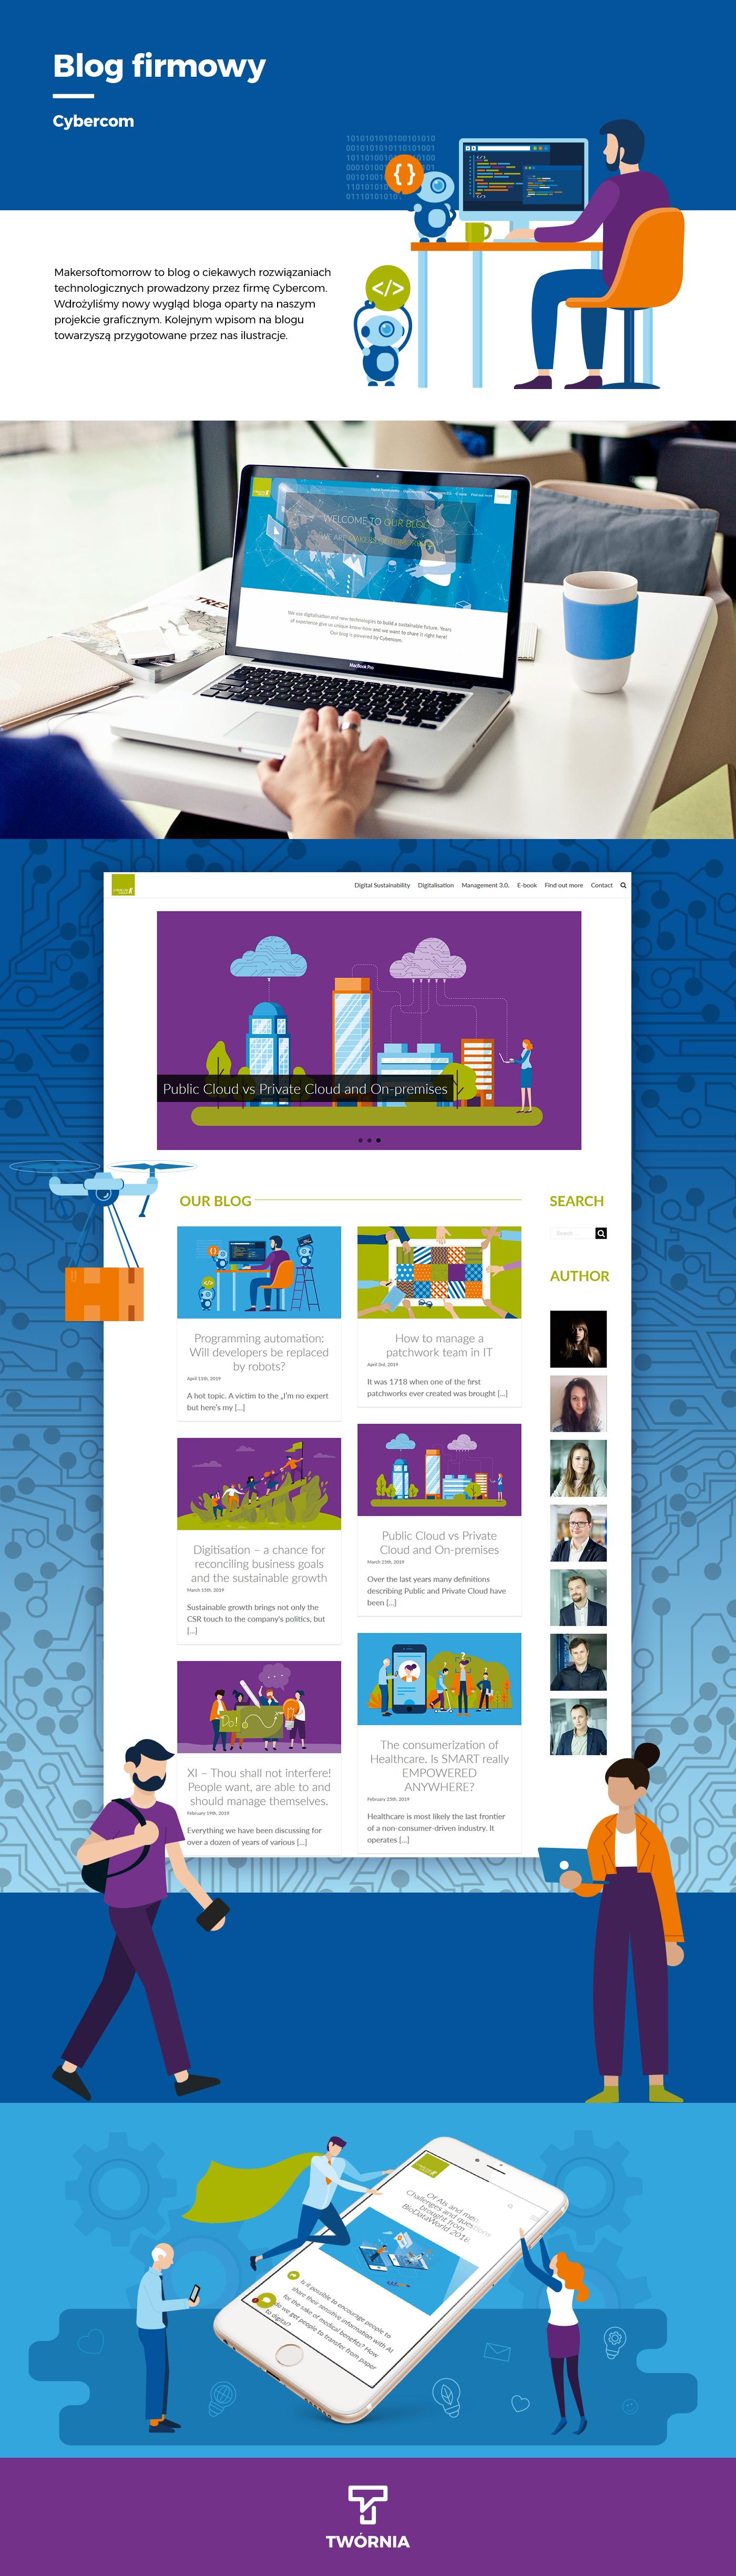 Webdesign Blog Strony Internetowe www blogi firmowe rysunki images